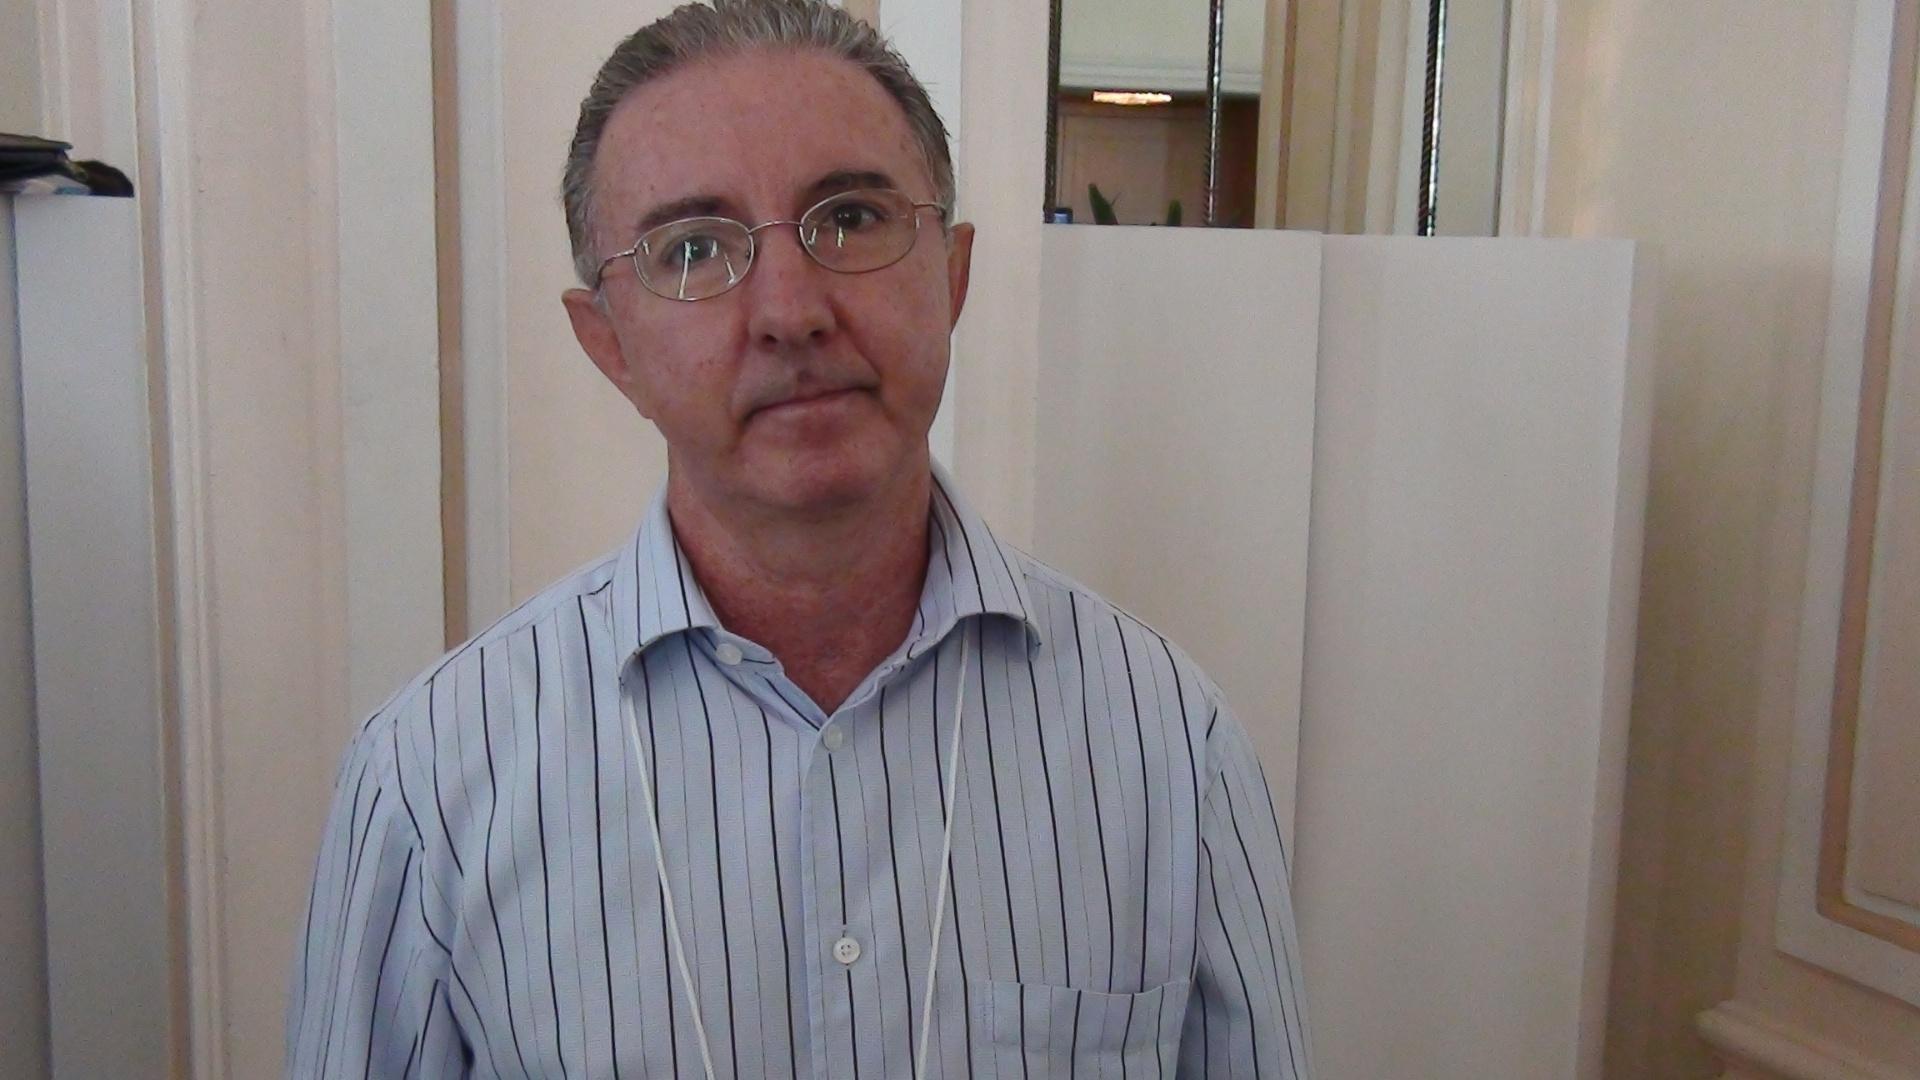 Paulo Zagallo participa do Footecon, congresso sobre futebol no Rio de Janeiro